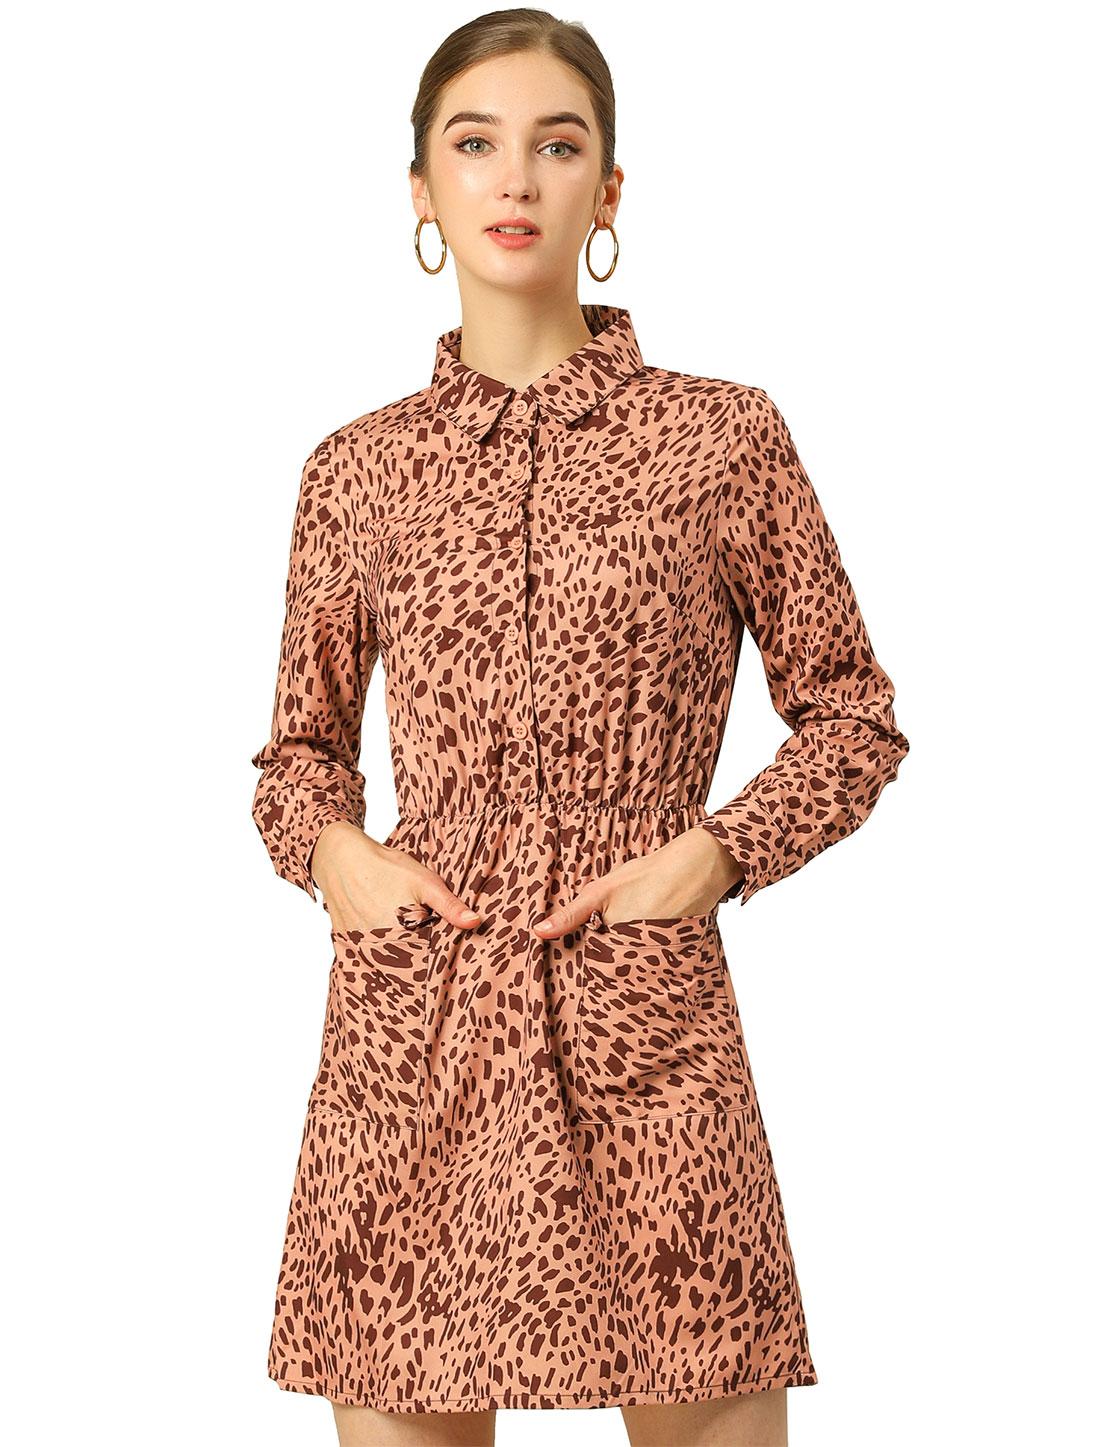 Allegra K Womens Leopard Prints Pocket Above Knee A Line Dress Brown S